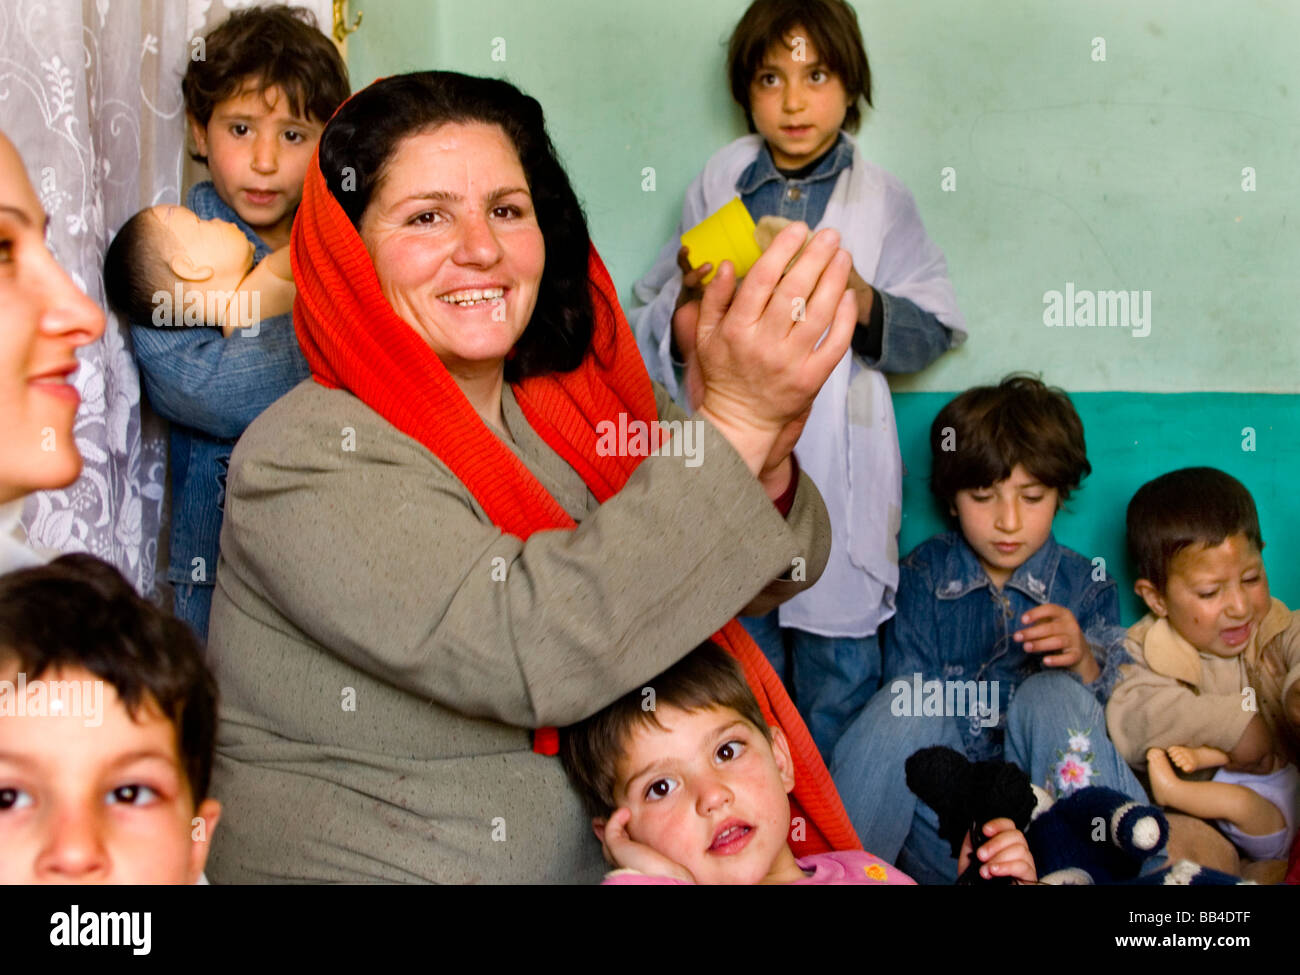 Afghan Music Stock Photos & Afghan Music Stock Images - Alamy